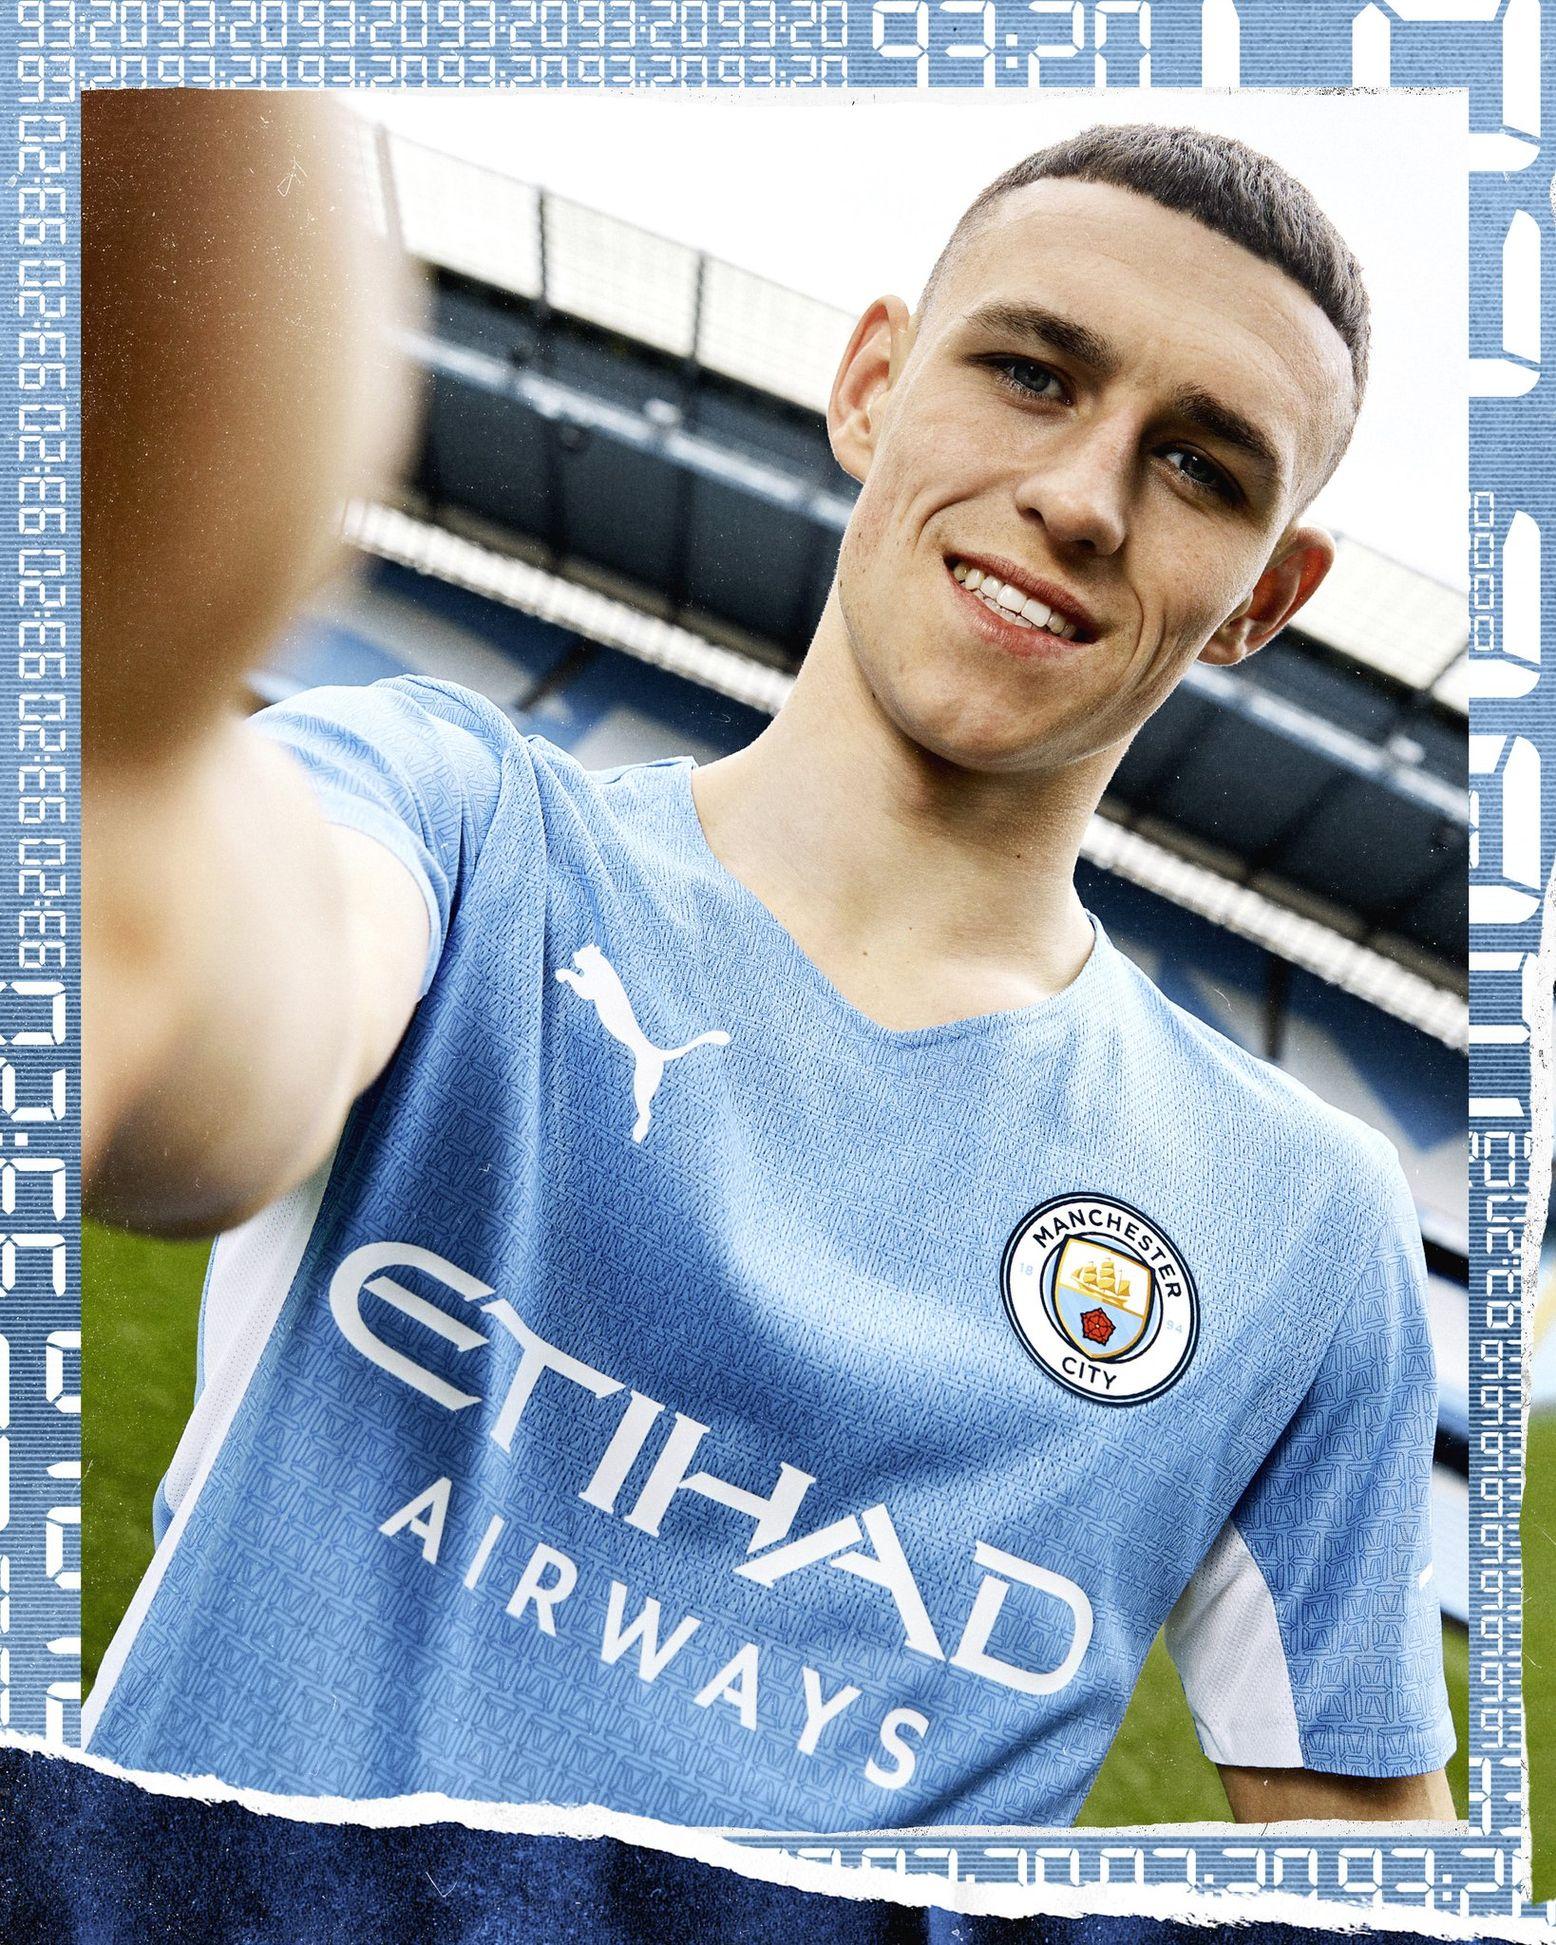 Manchester City 2021 22 Puma Home Kit 21 22 Kits Football Shirt Blog